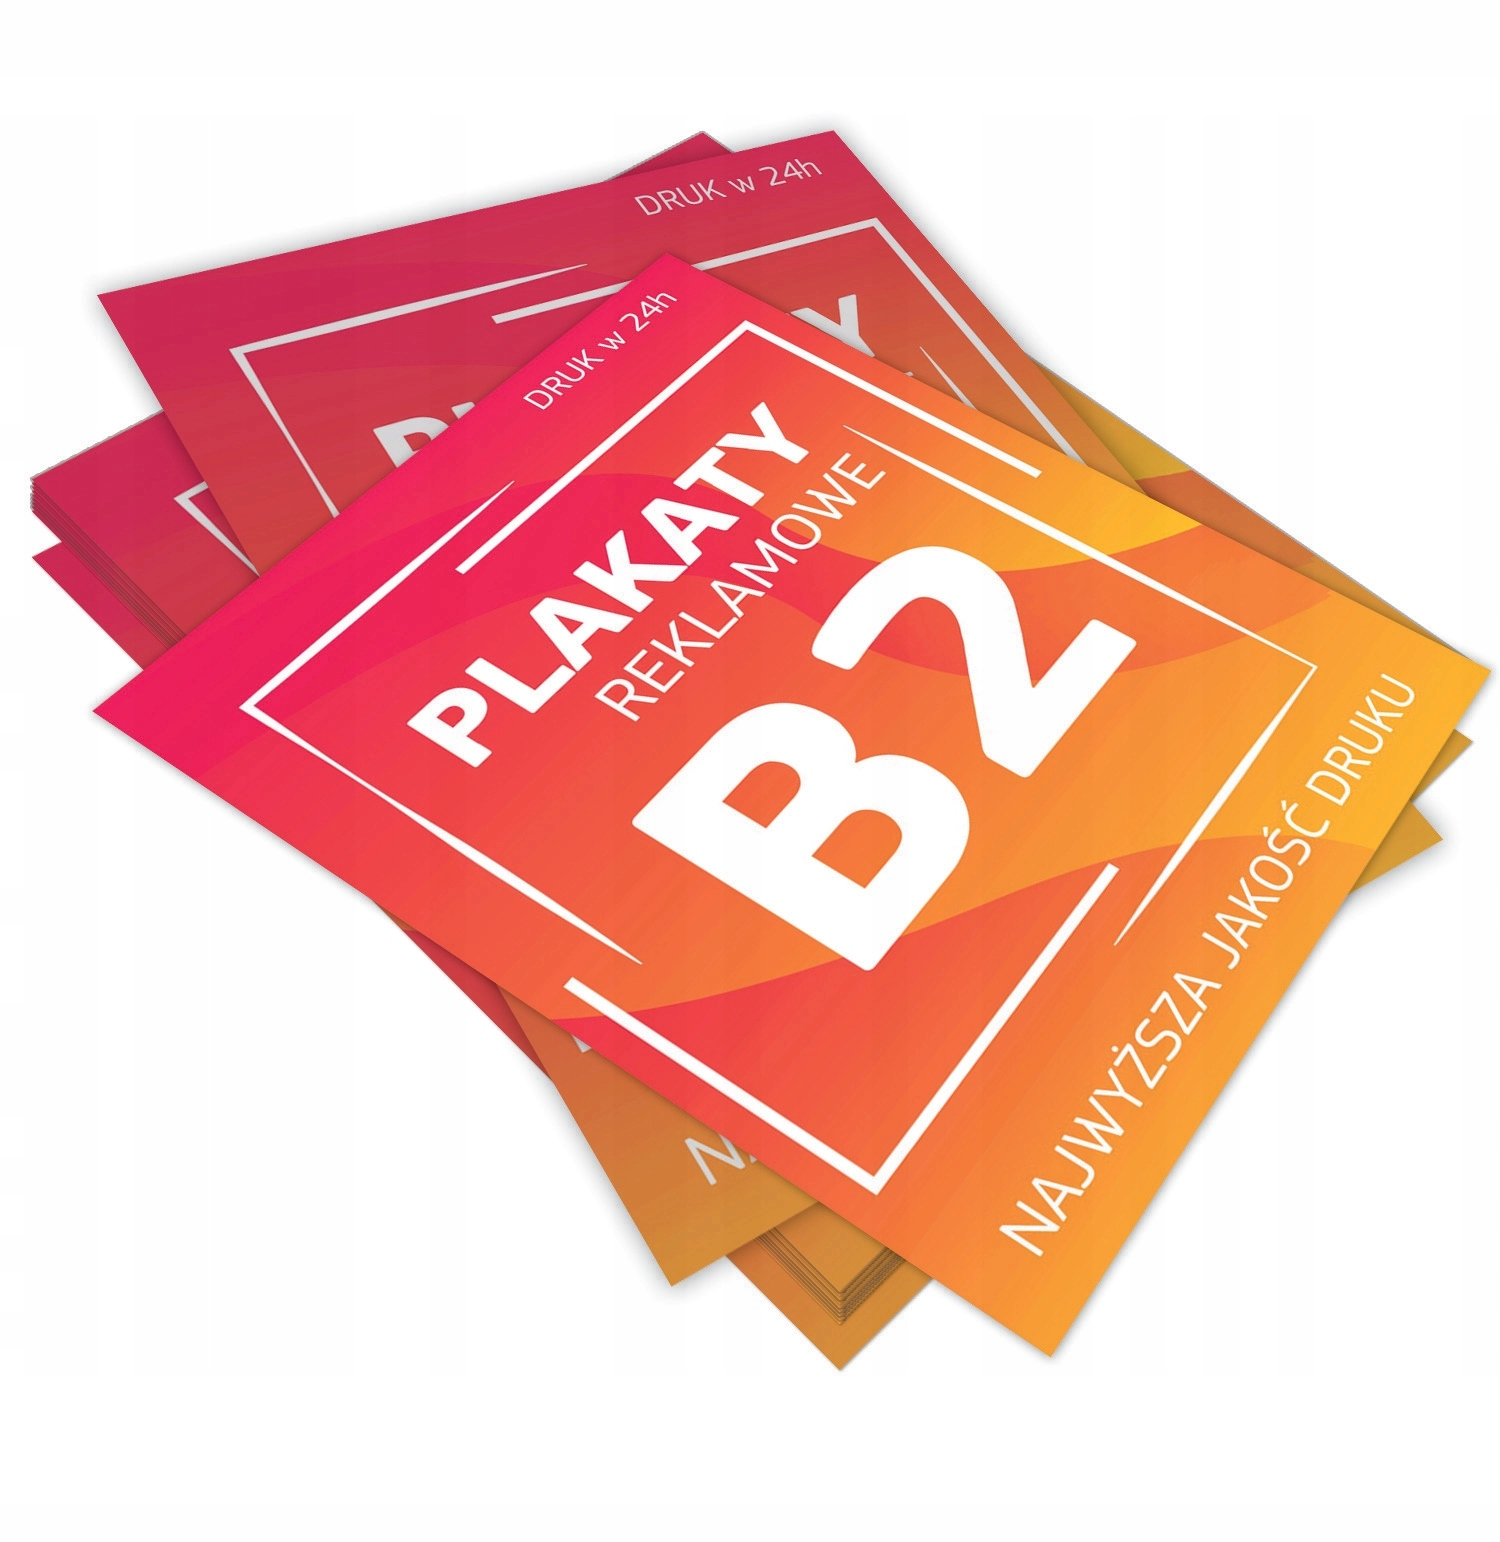 Plakaty Reklamowe B2 Druk 10szt Promocja 7528162254